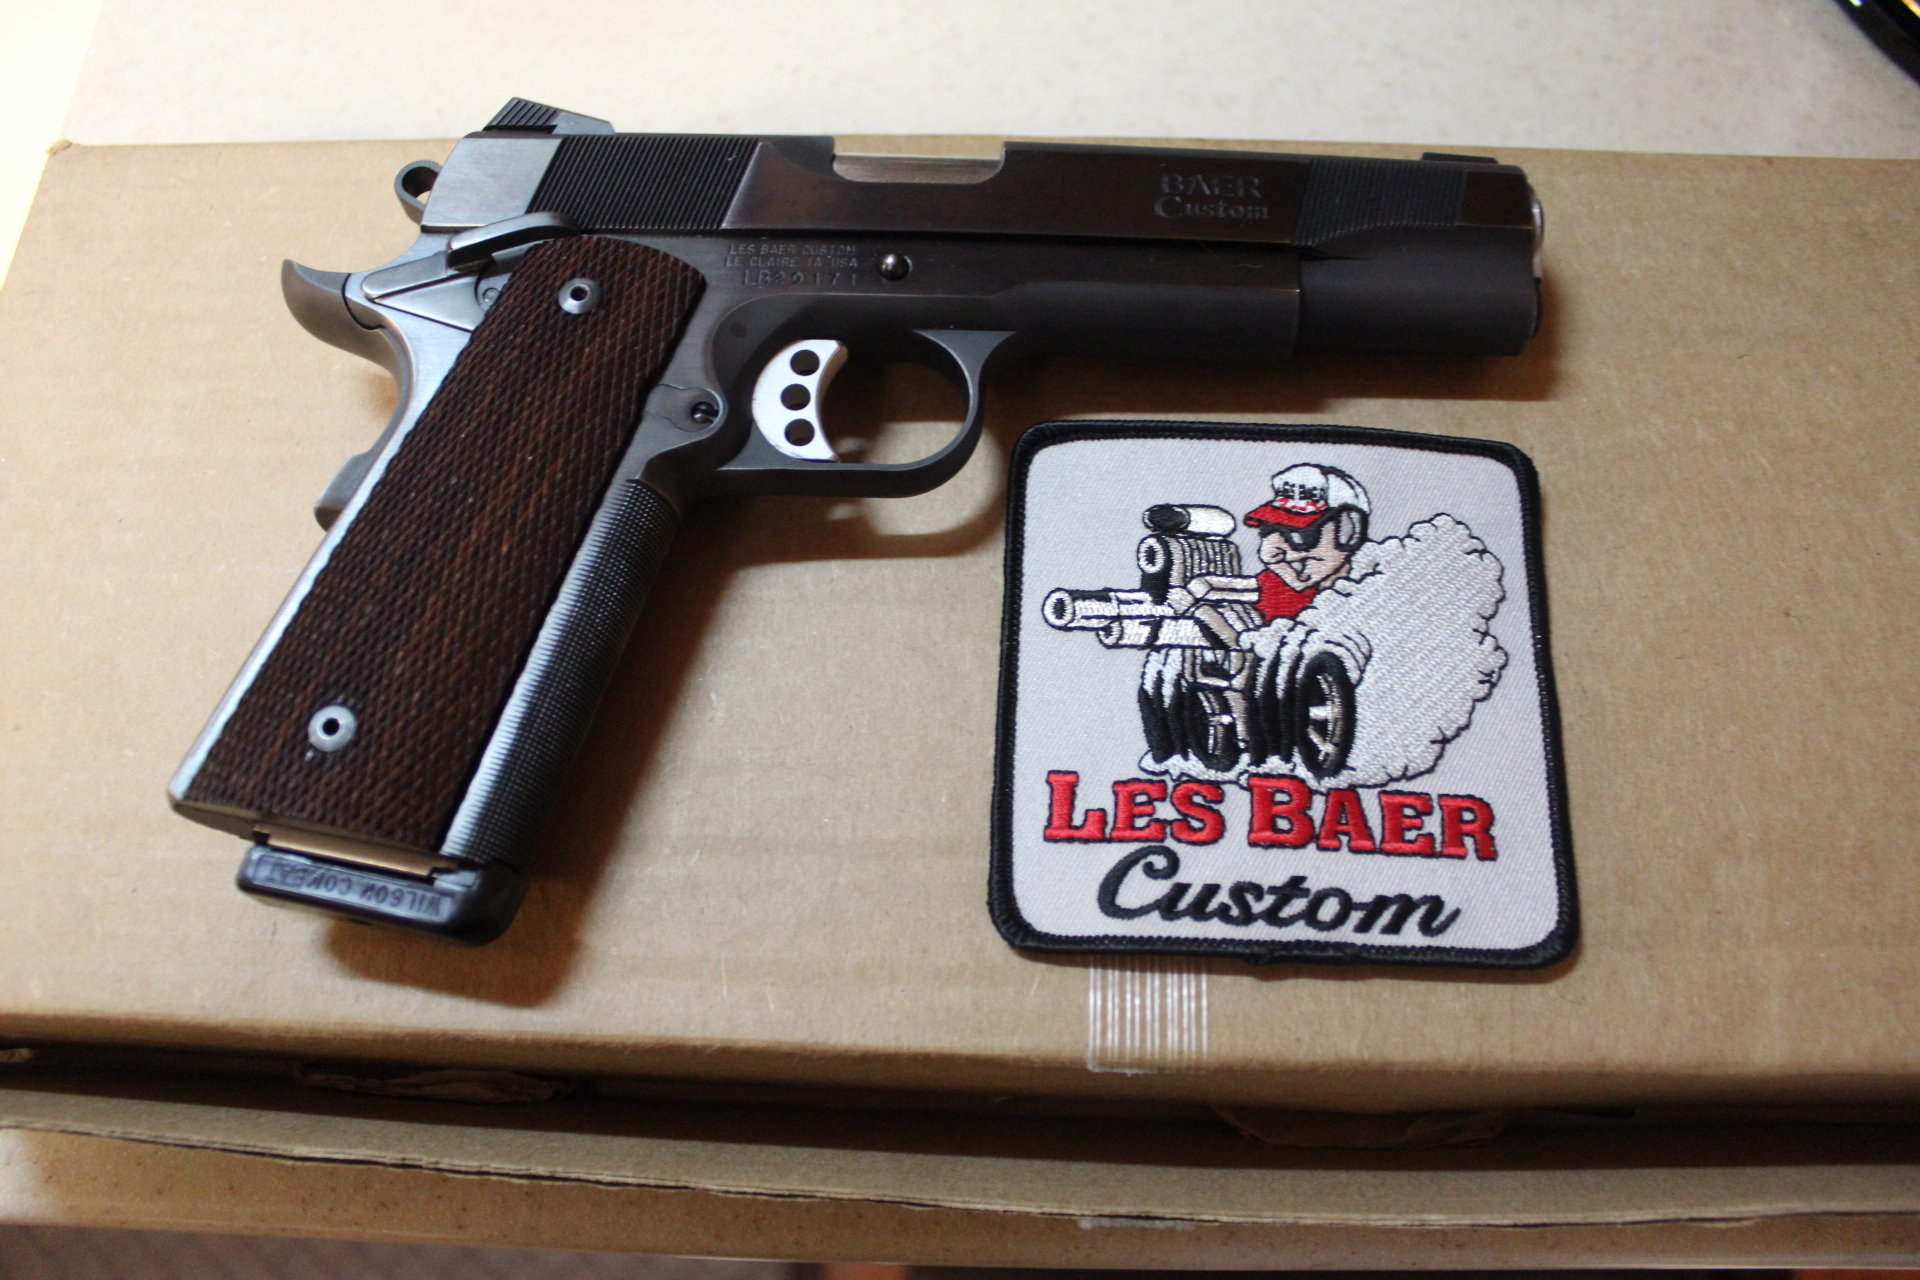 Does anyone have pet names for their guns?-les_baer_r.jpg